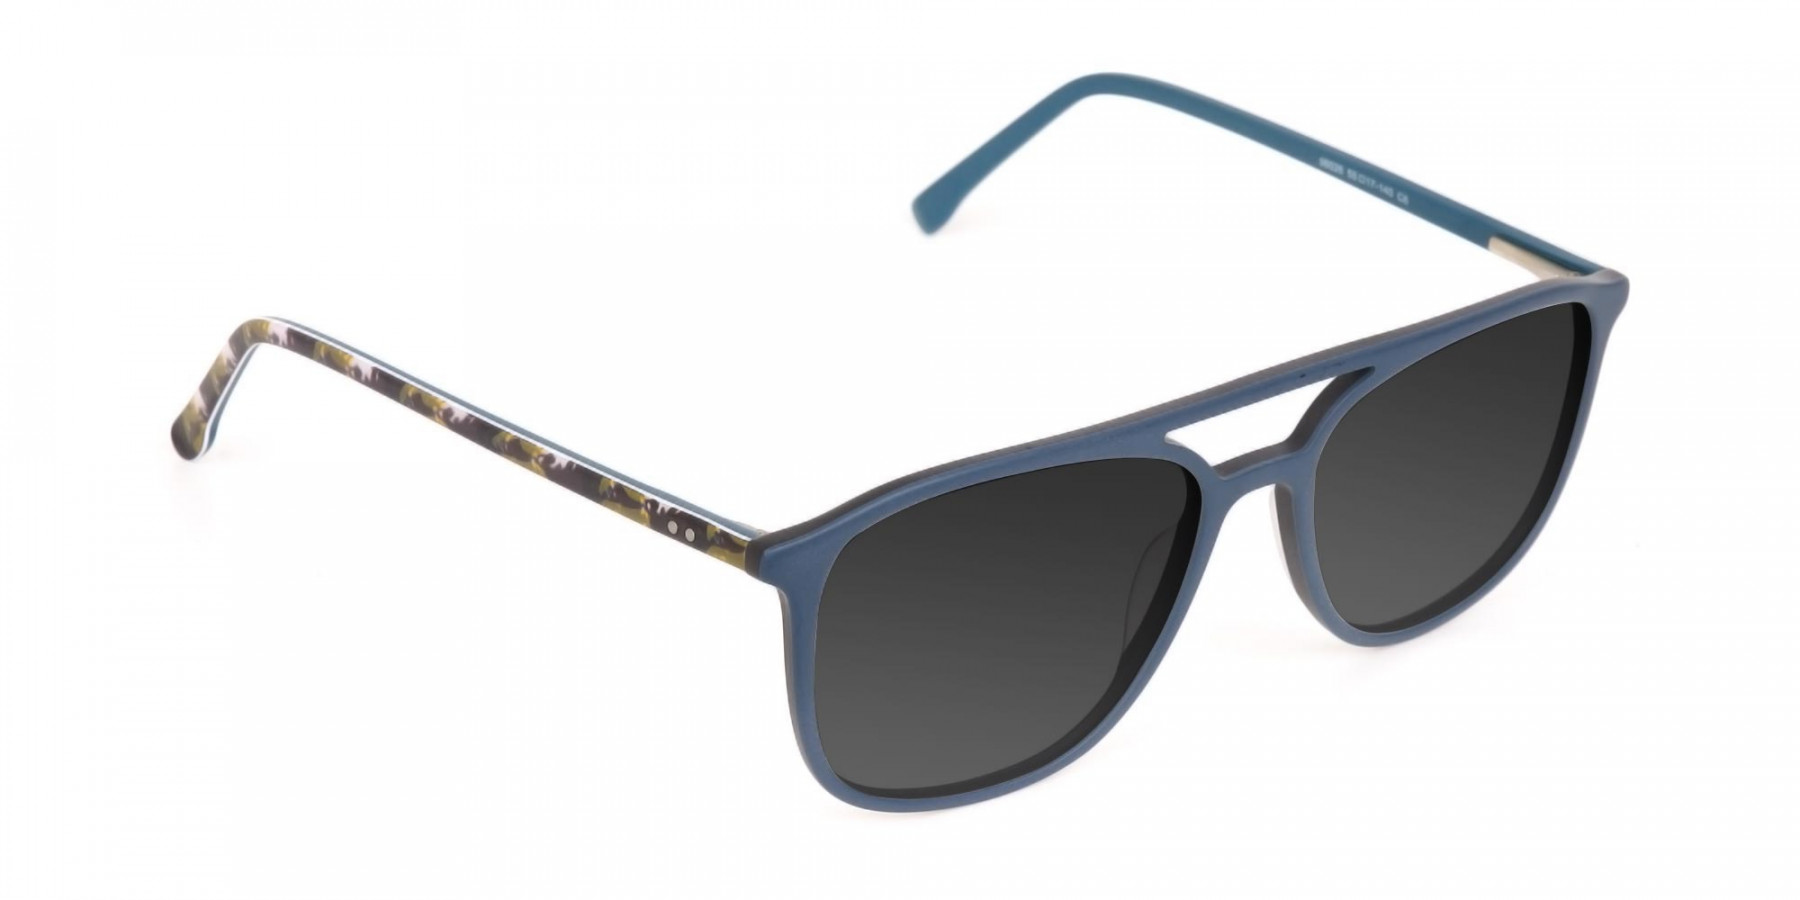 Green Rectangular Sunglasses - 3